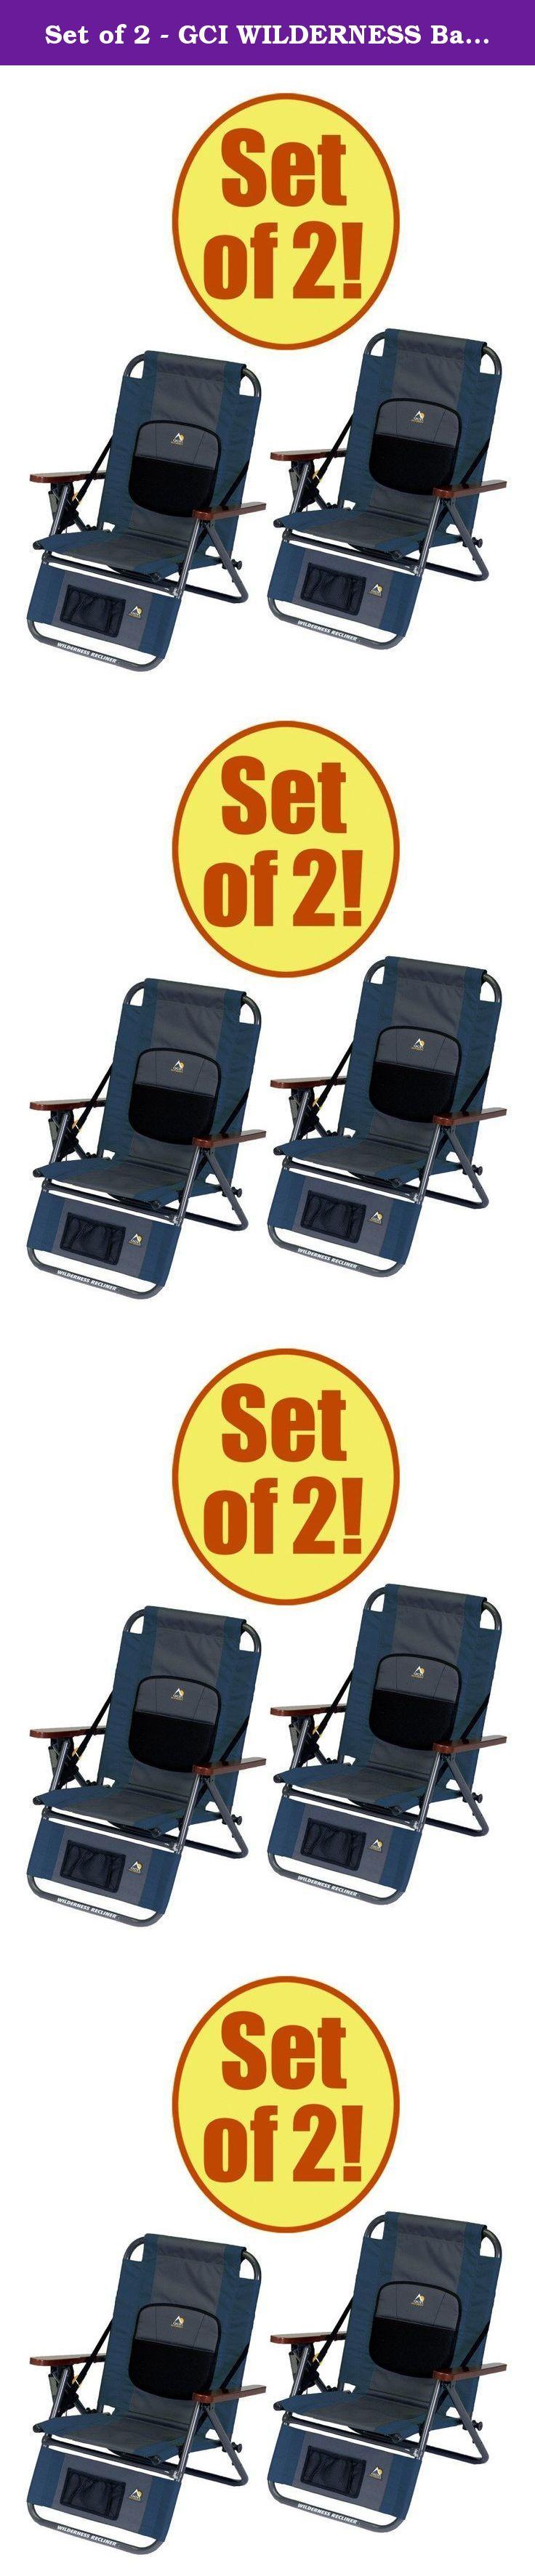 03eb6d290d Set of 2 - GCI WILDERNESS Backpack Recliner. Recliner Specs  25 x 23 x